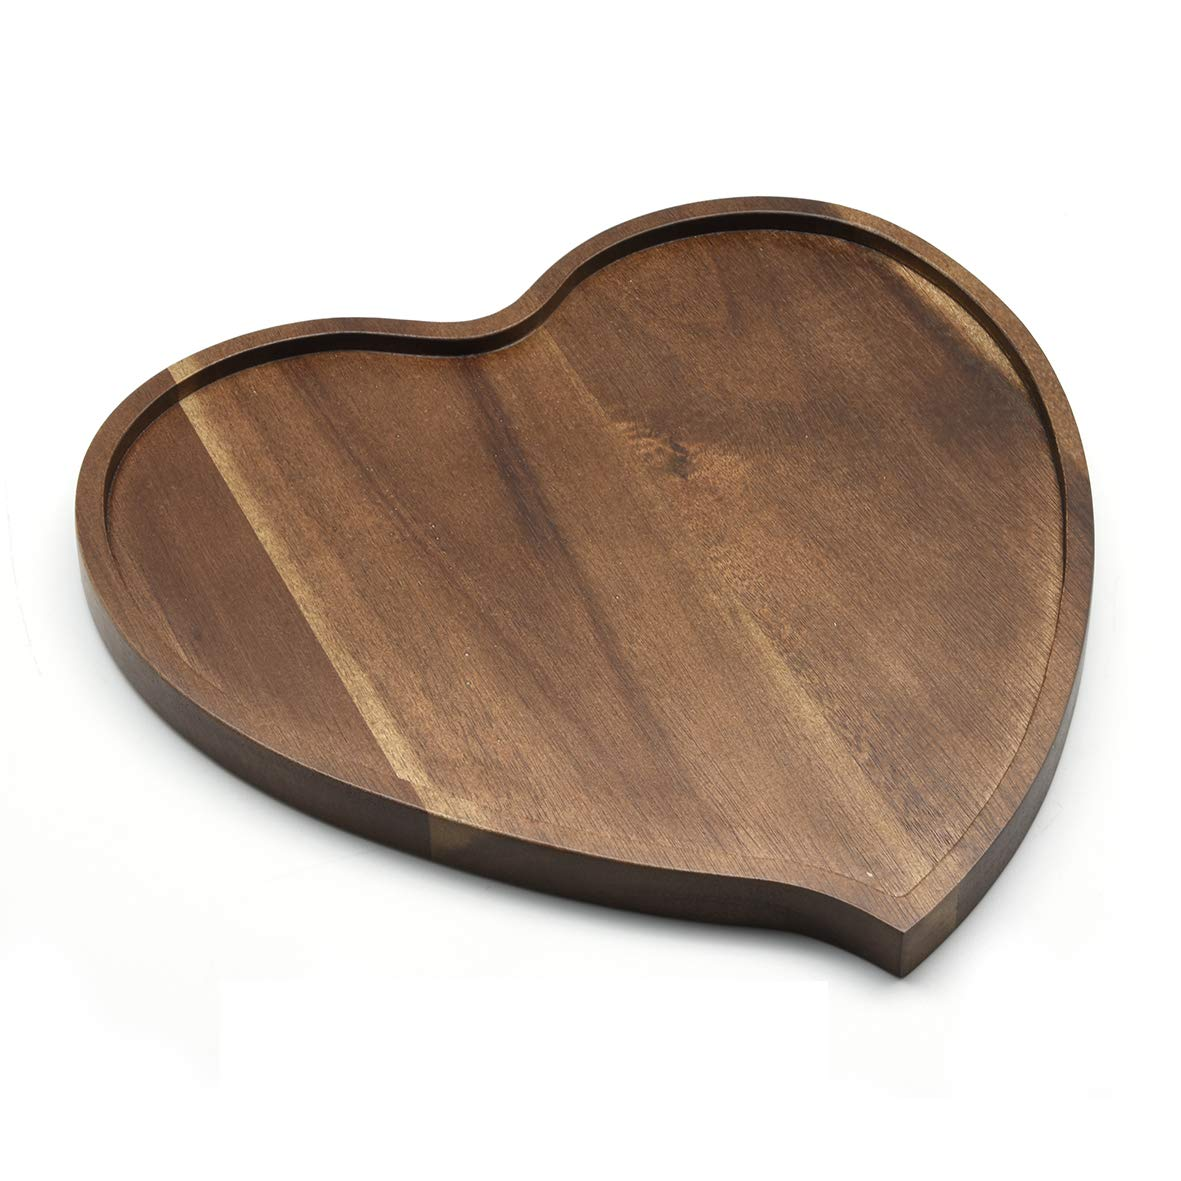 10 Acacia Wood Heart Shaped Bowls Sustainably Harvested Fair Trade